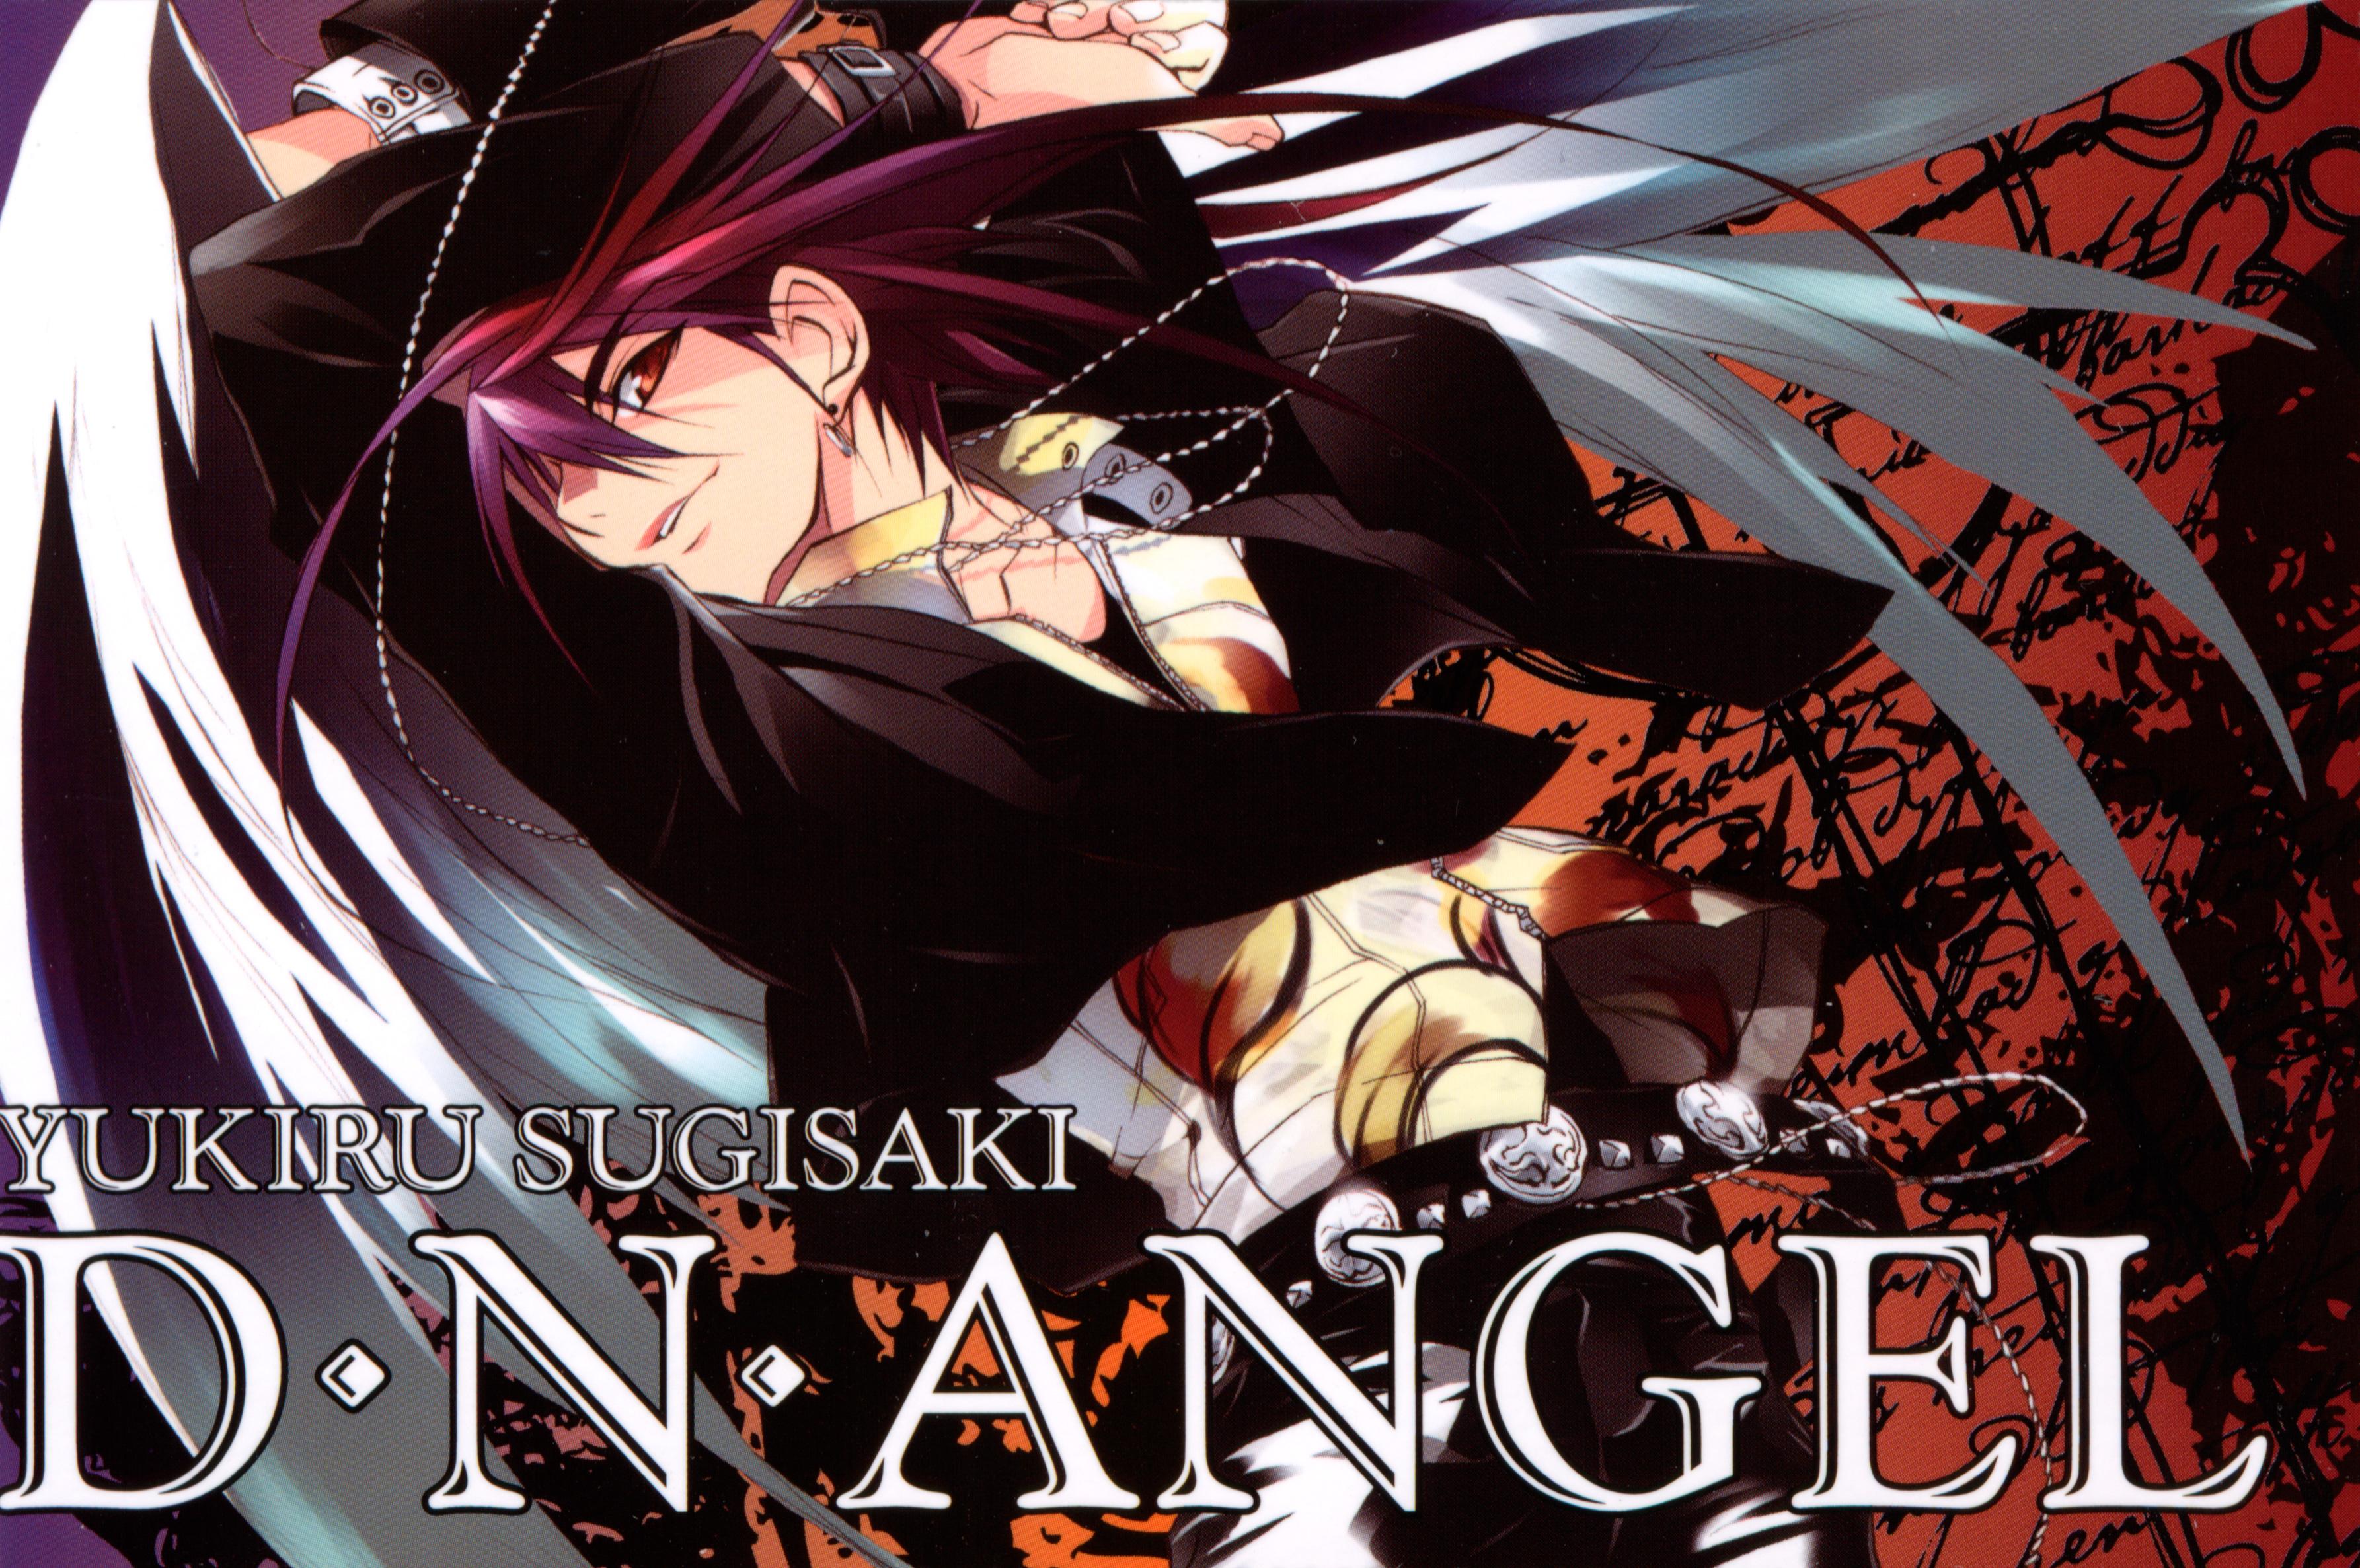 D. N. Angel, red hair | page 8 zerochan anime image board.